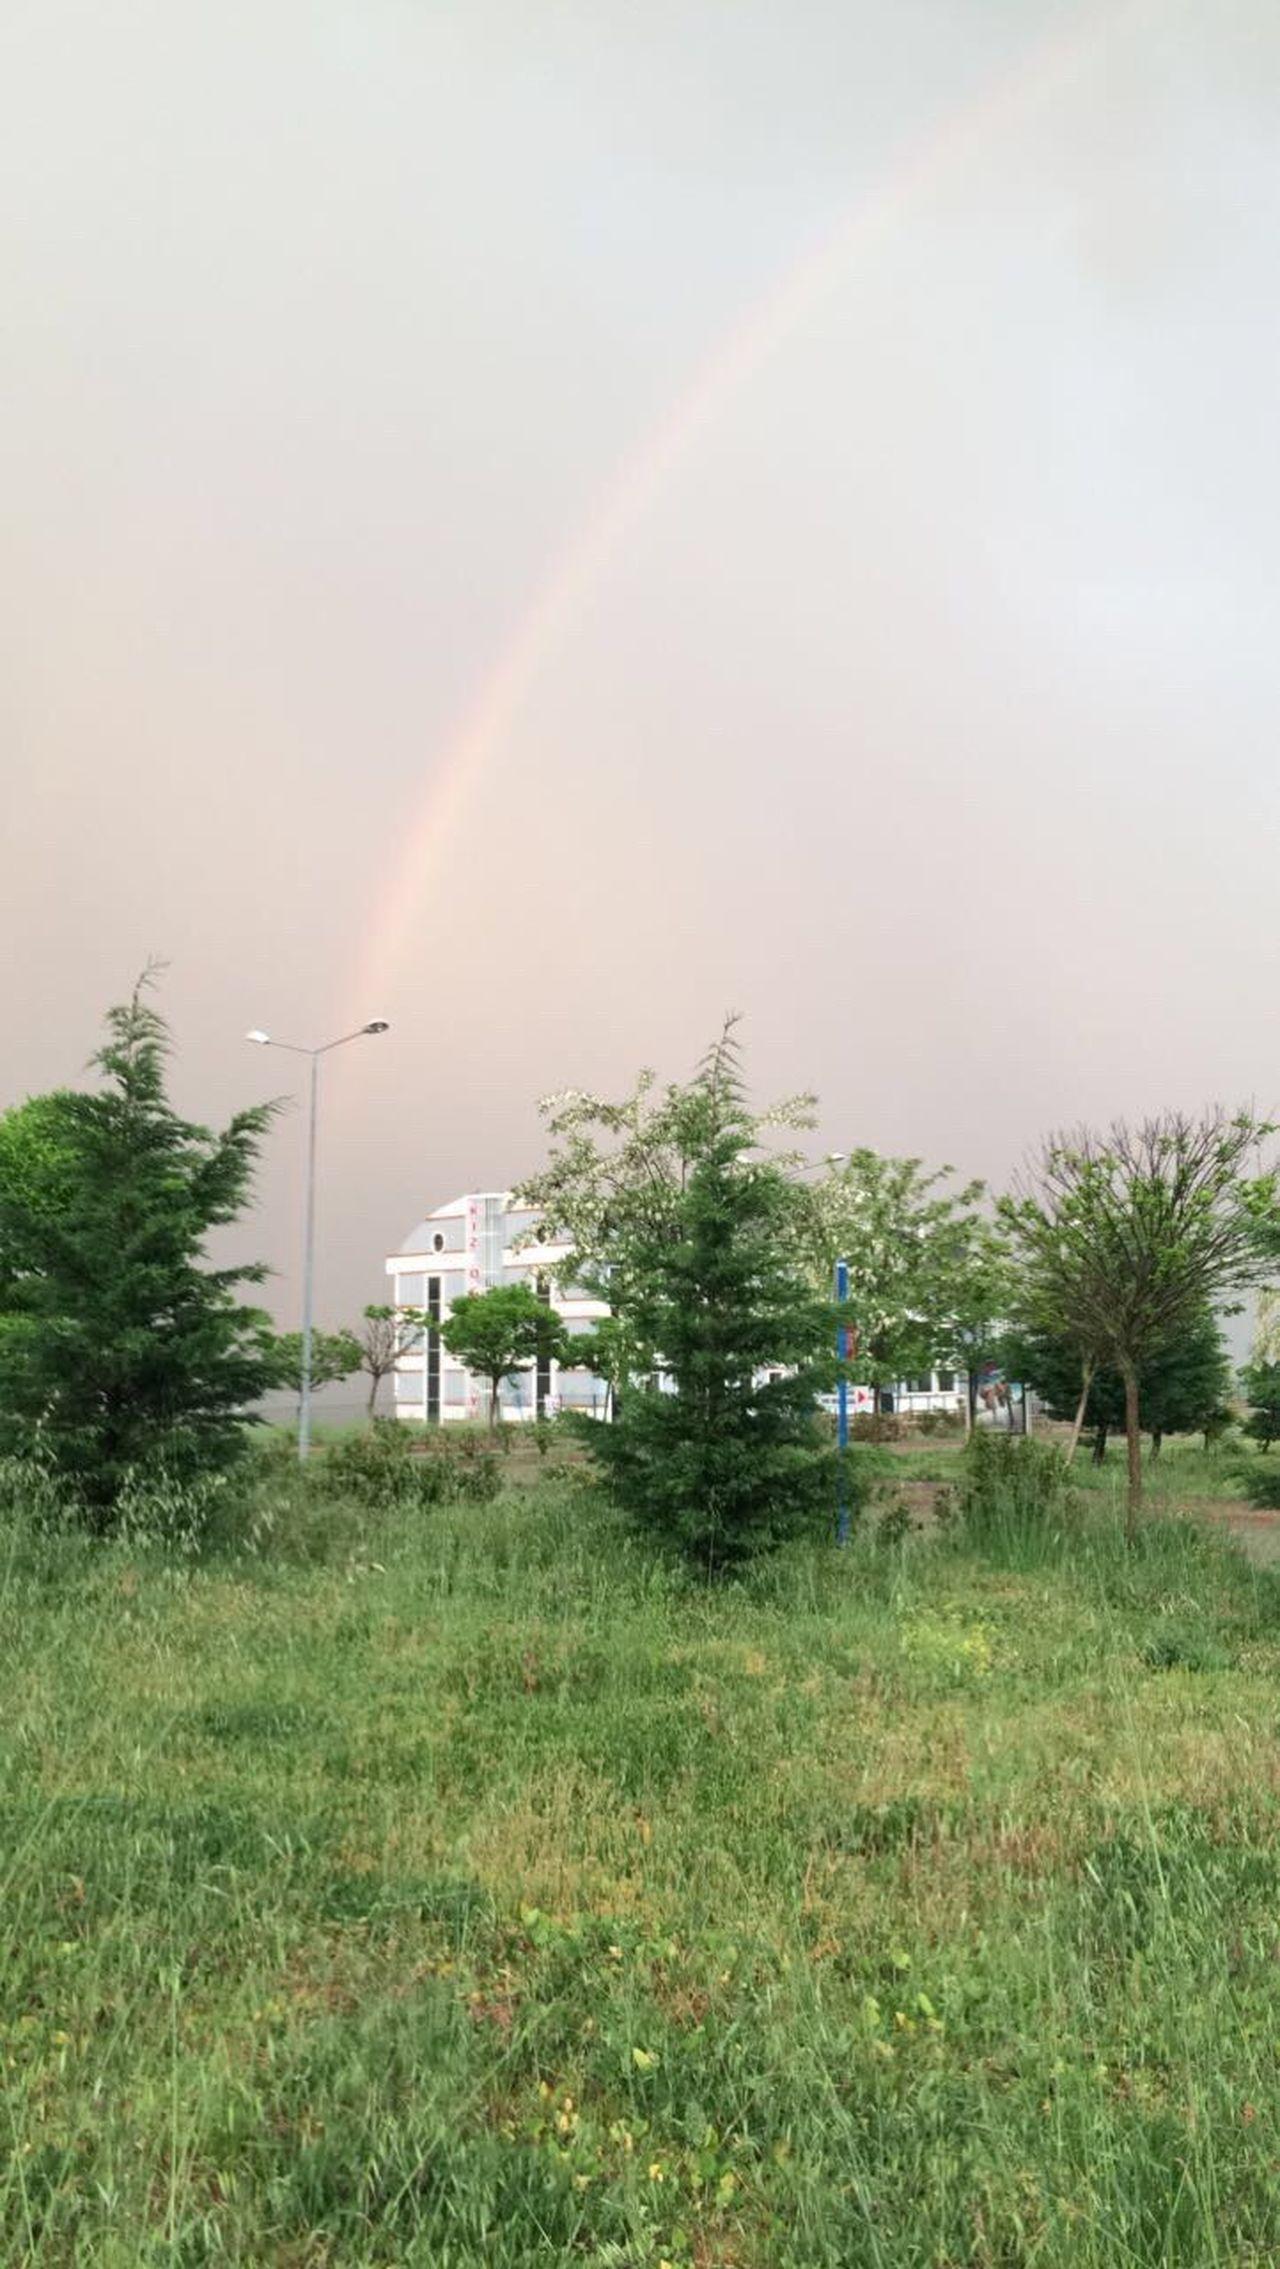 Rainbow Sky Clouds And Sky Turkey MyUniversity University RainyDay No People Grass Outdoors Green Tree Beauty In Nature EyeEm Nature Lover EyeEm EyeEm Gallery Scenics Irrigation Equipment